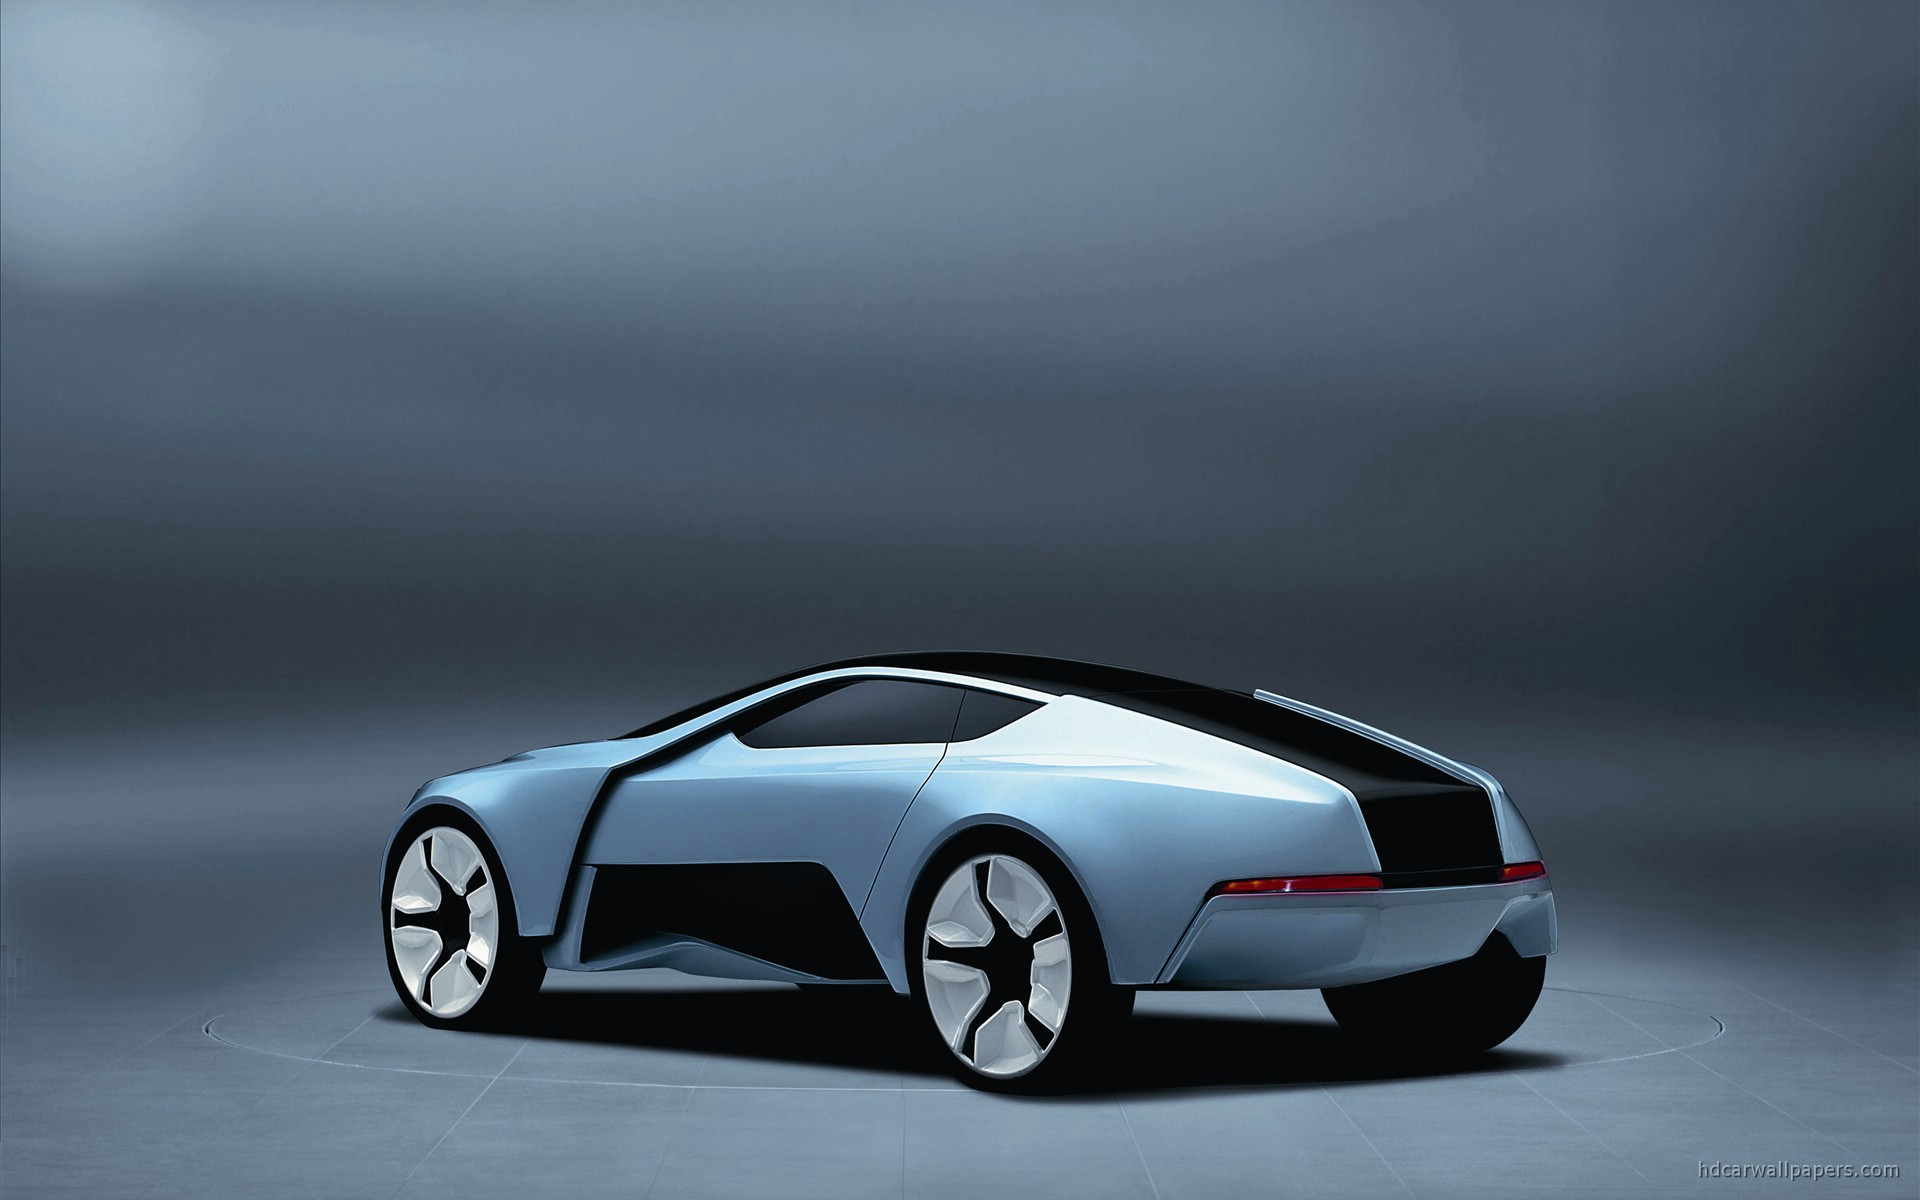 Audi Rs3 Wallpaper Hd Audi Promotes Intelligent Emotion Project 3 Wallpaper Hd